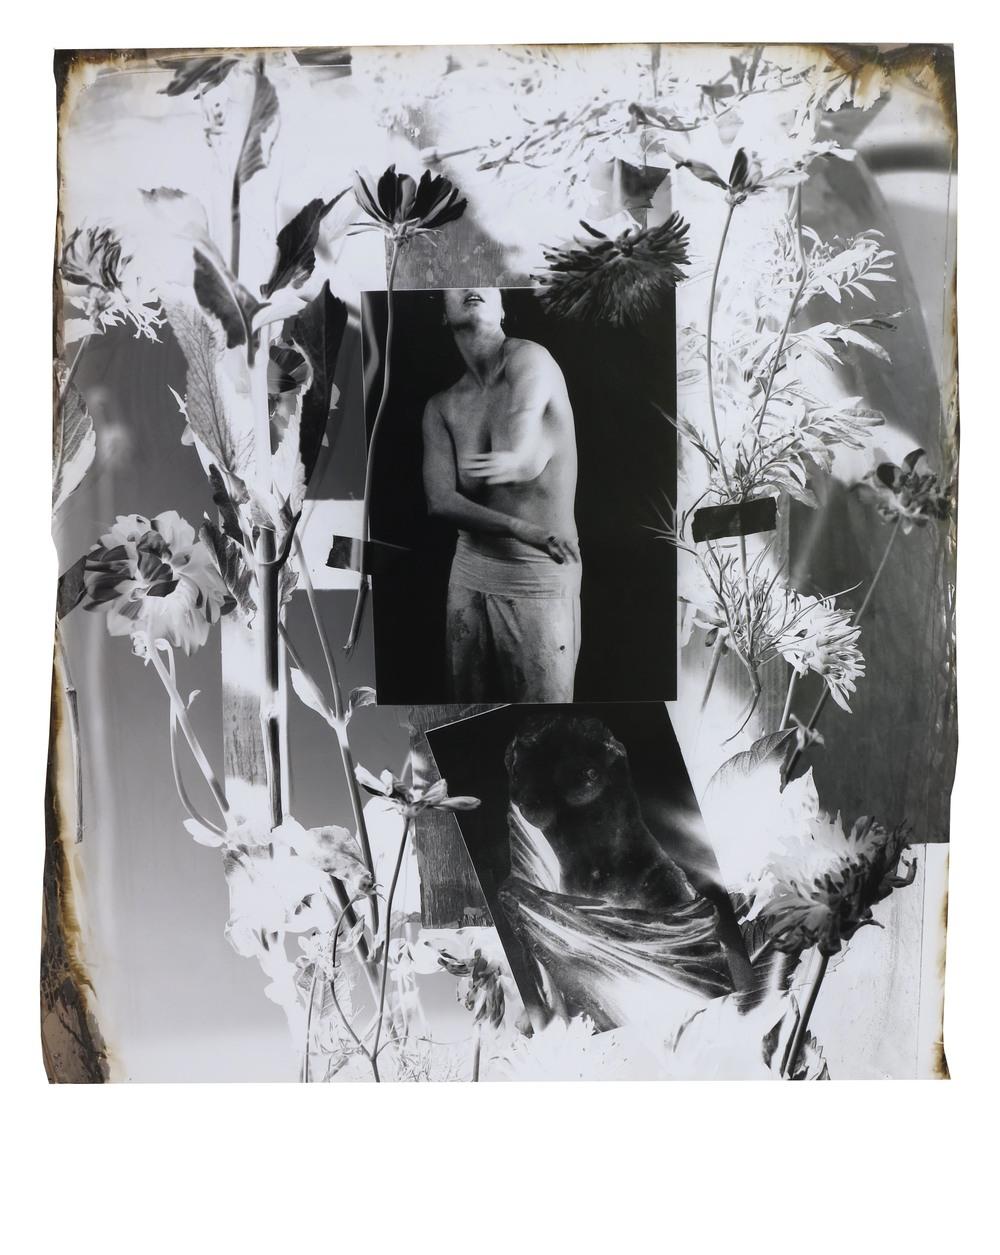 Rachel's Gesture of Refusal  1995  gelatin silver print  42 x 36 inches